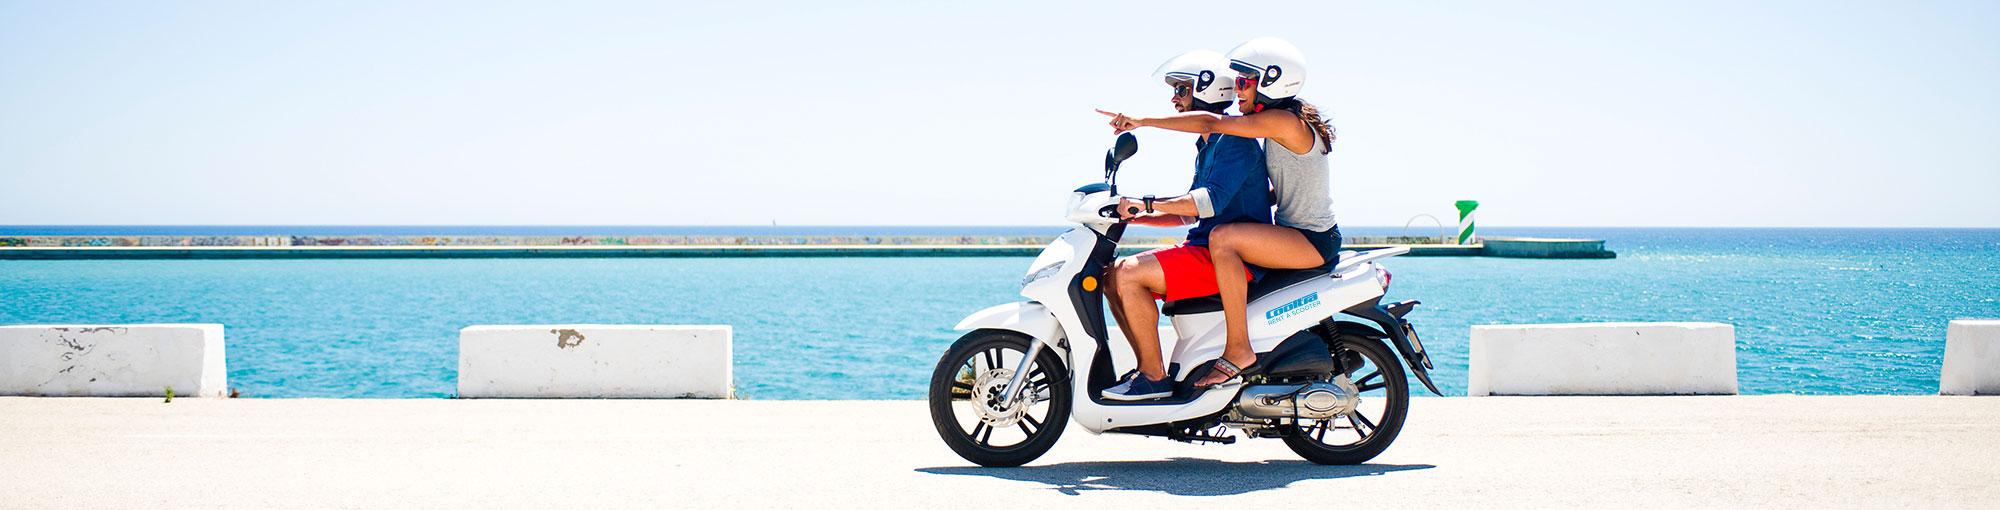 Cooltra aluguer de motas scooter